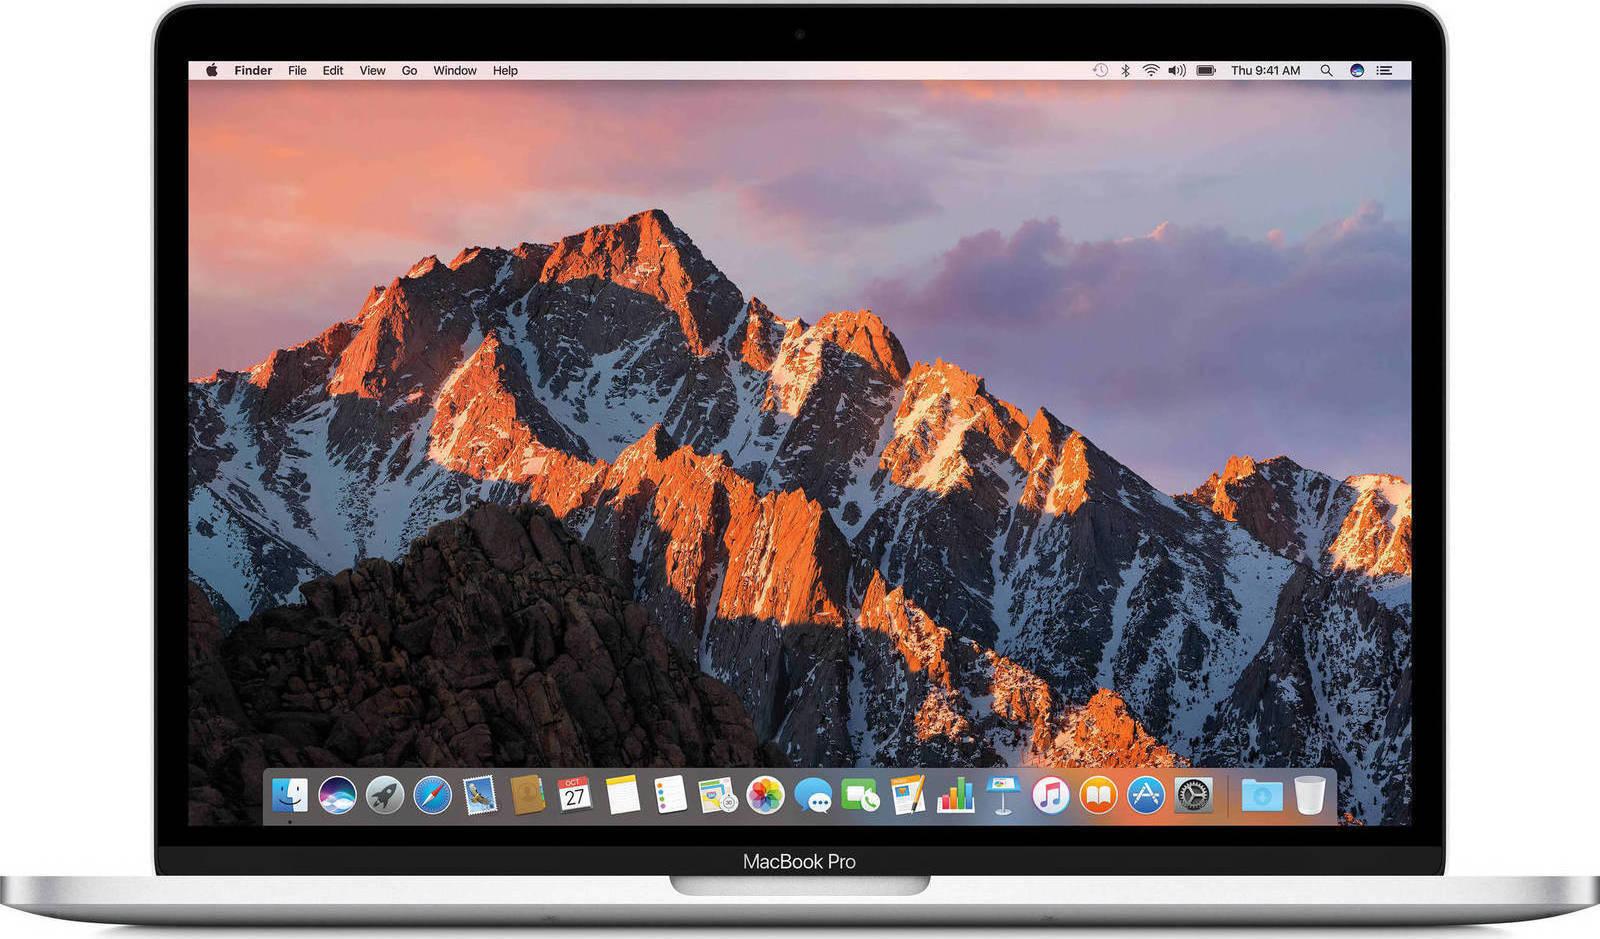 Apple MacBook Pro MPXR2 13.3'' 2.3GHz i5/8GB/128GB Silver English Keyboard Με Αντάπτορα Πληρωμή έως 12 δόσεις